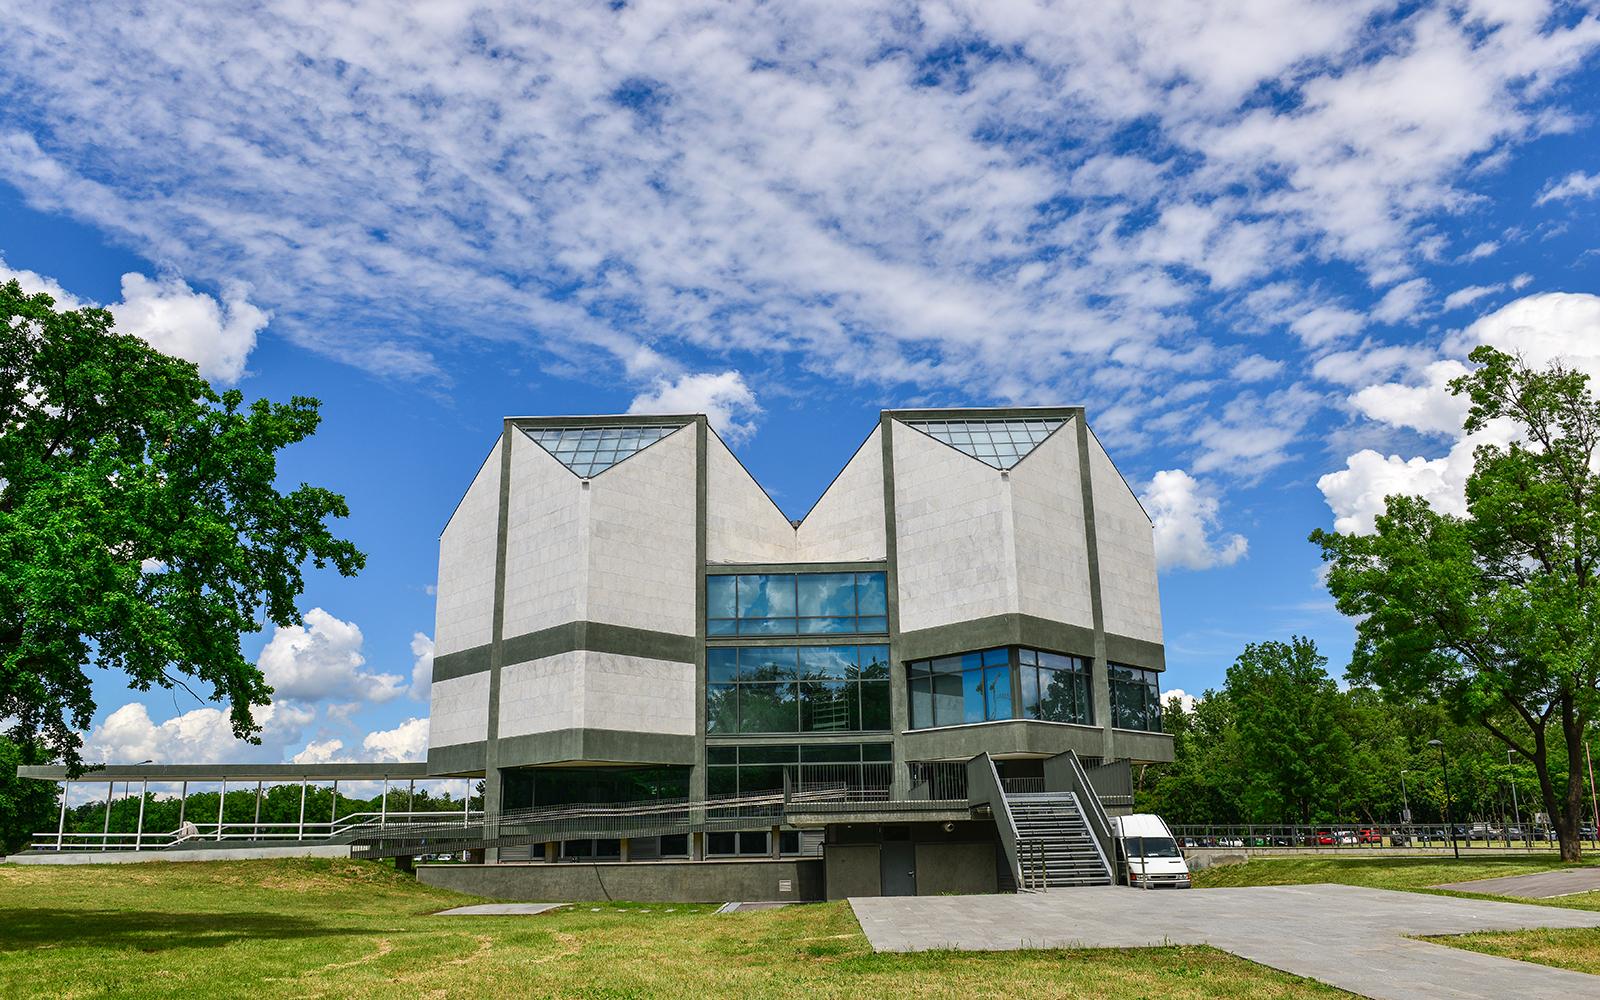 Konkurs za idejno rešenje paviljona Muzeja savremene umetnosti